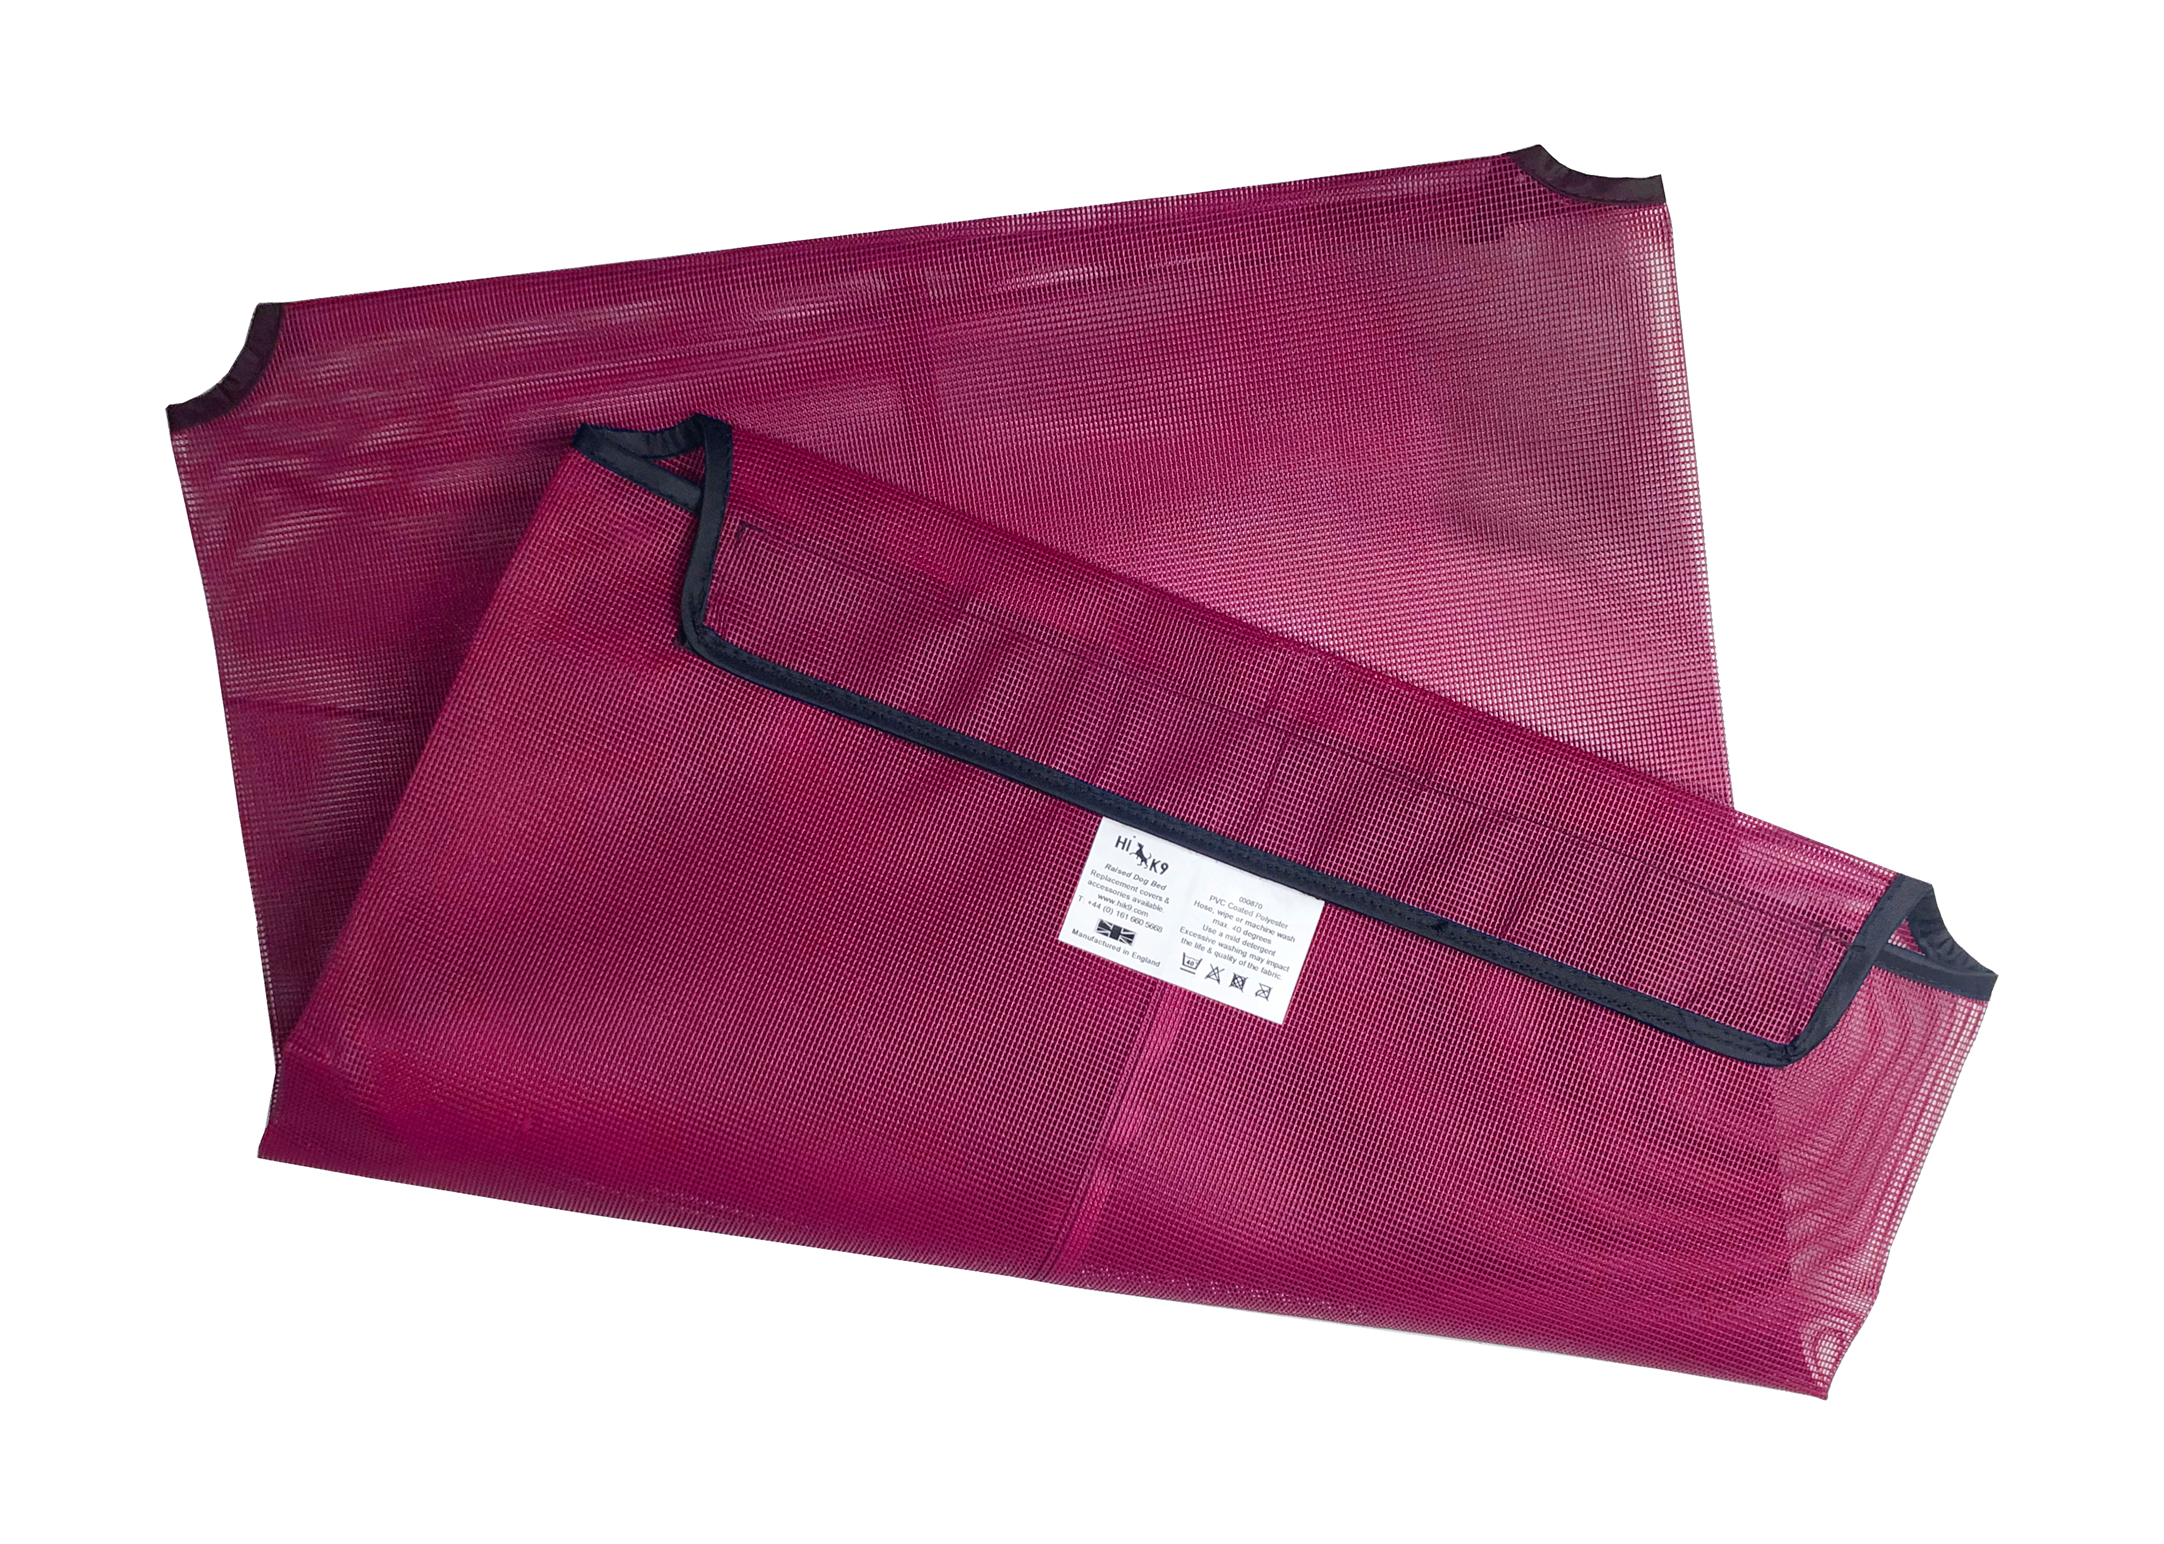 Hi-K9 Mesh Cover Pink Bed